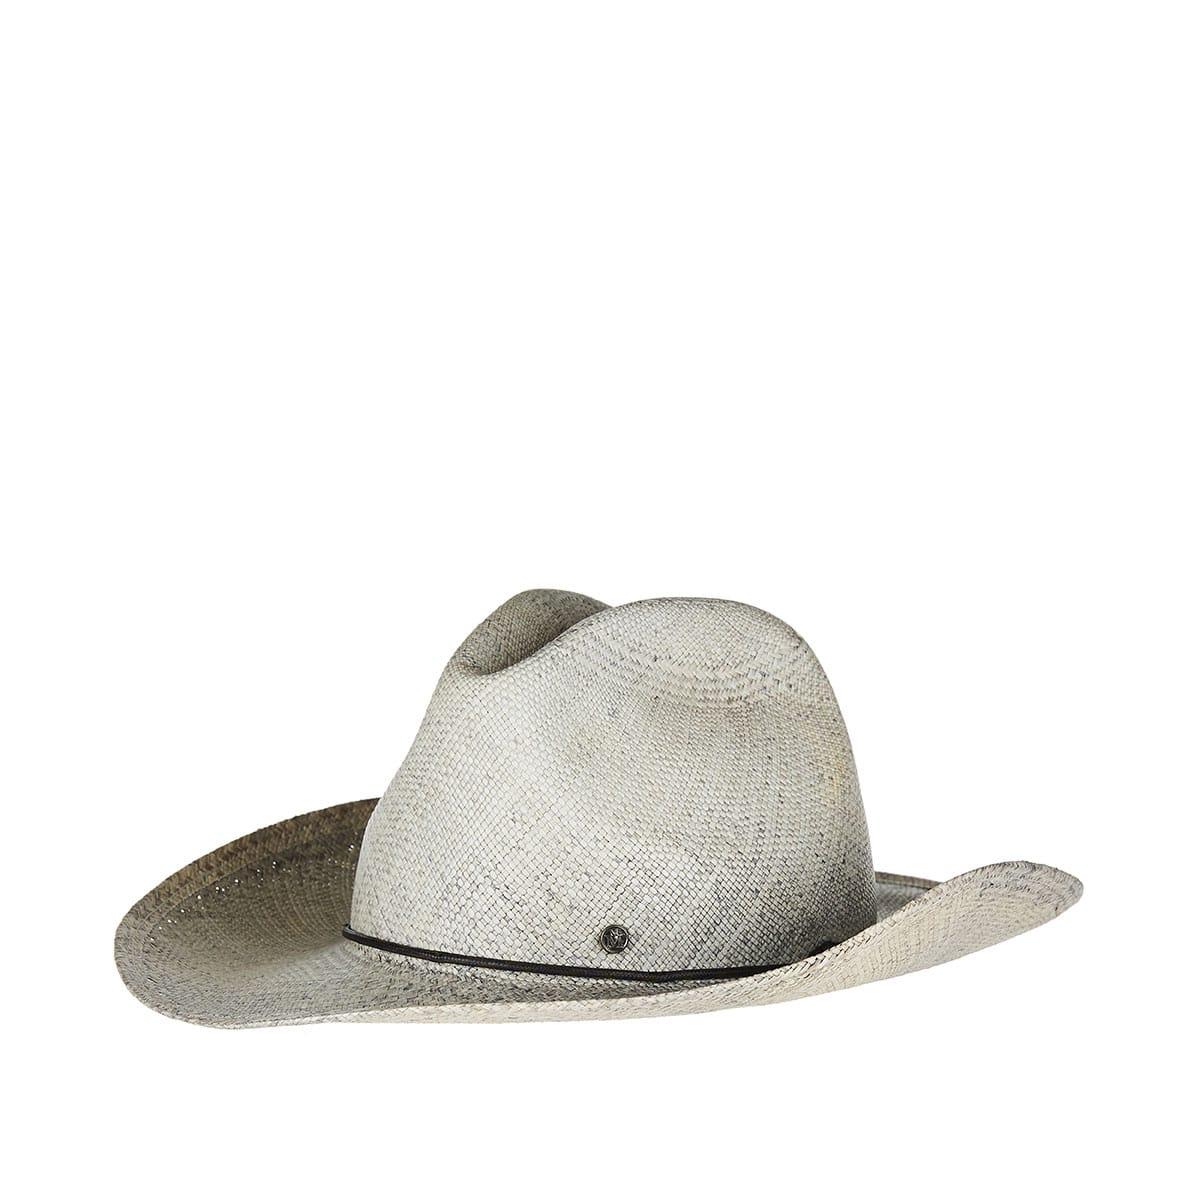 Austin woven straw hat